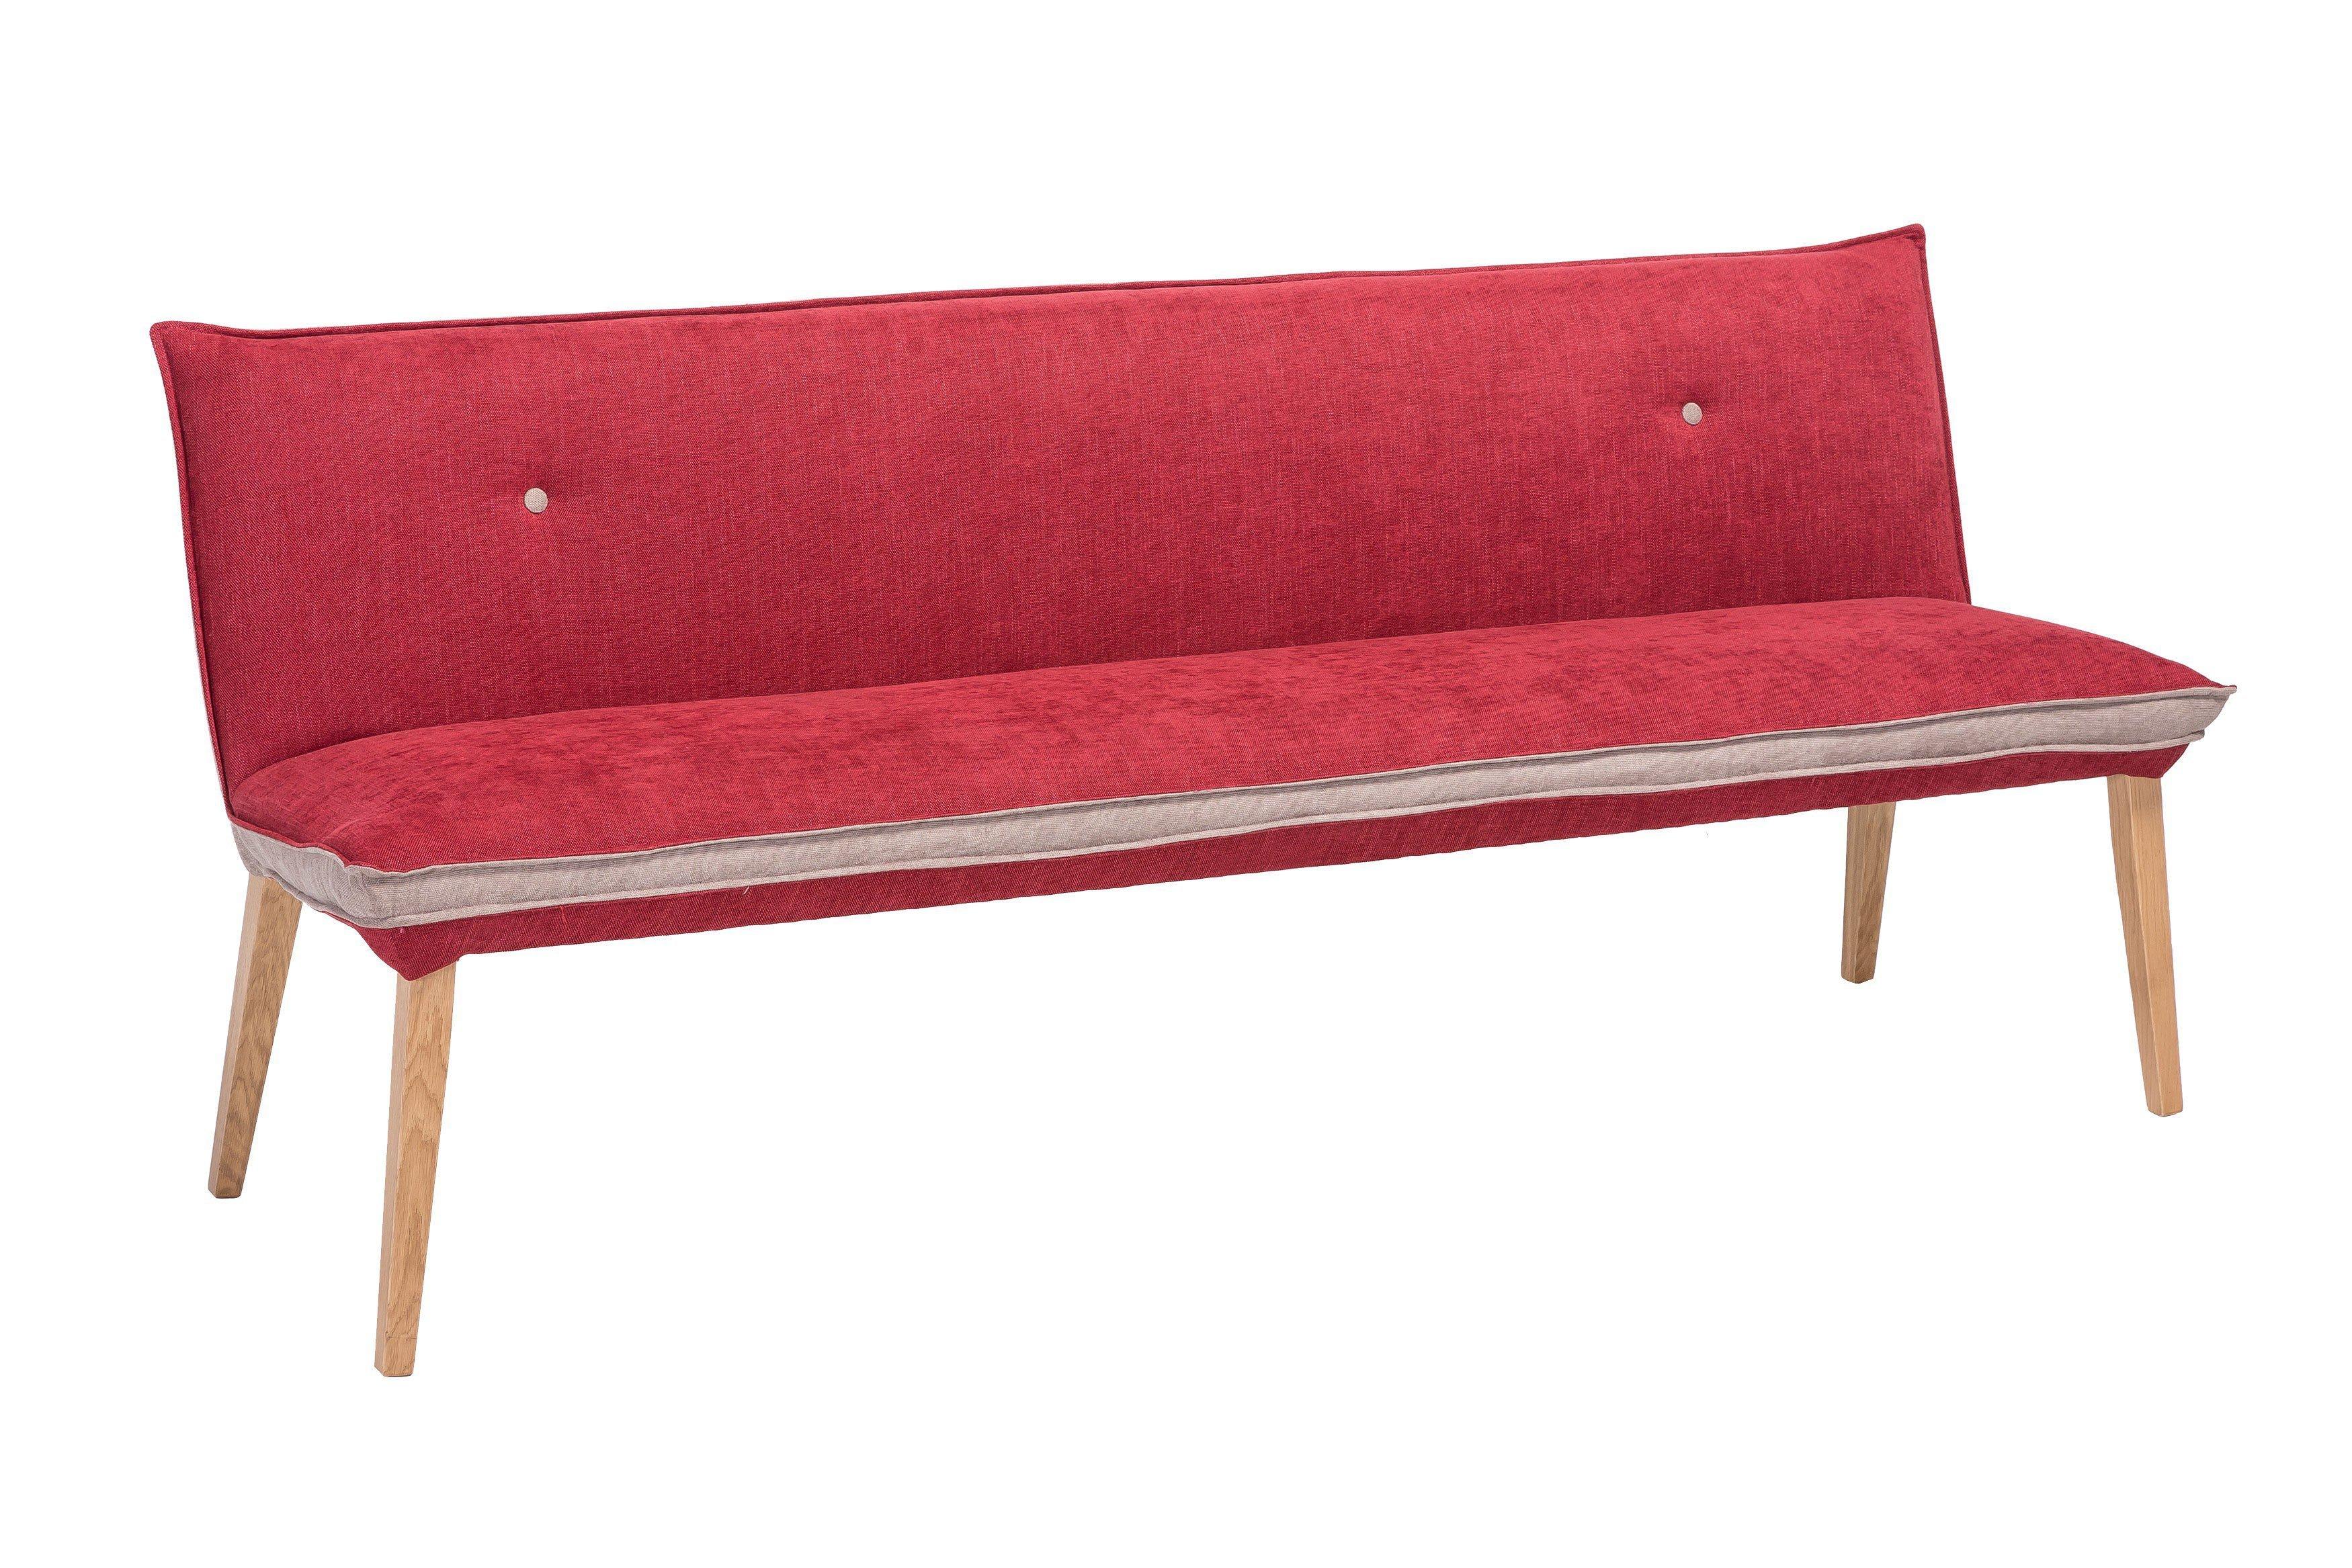 Genua Von Standard Furniture   Bank In Eiche/ Rosso